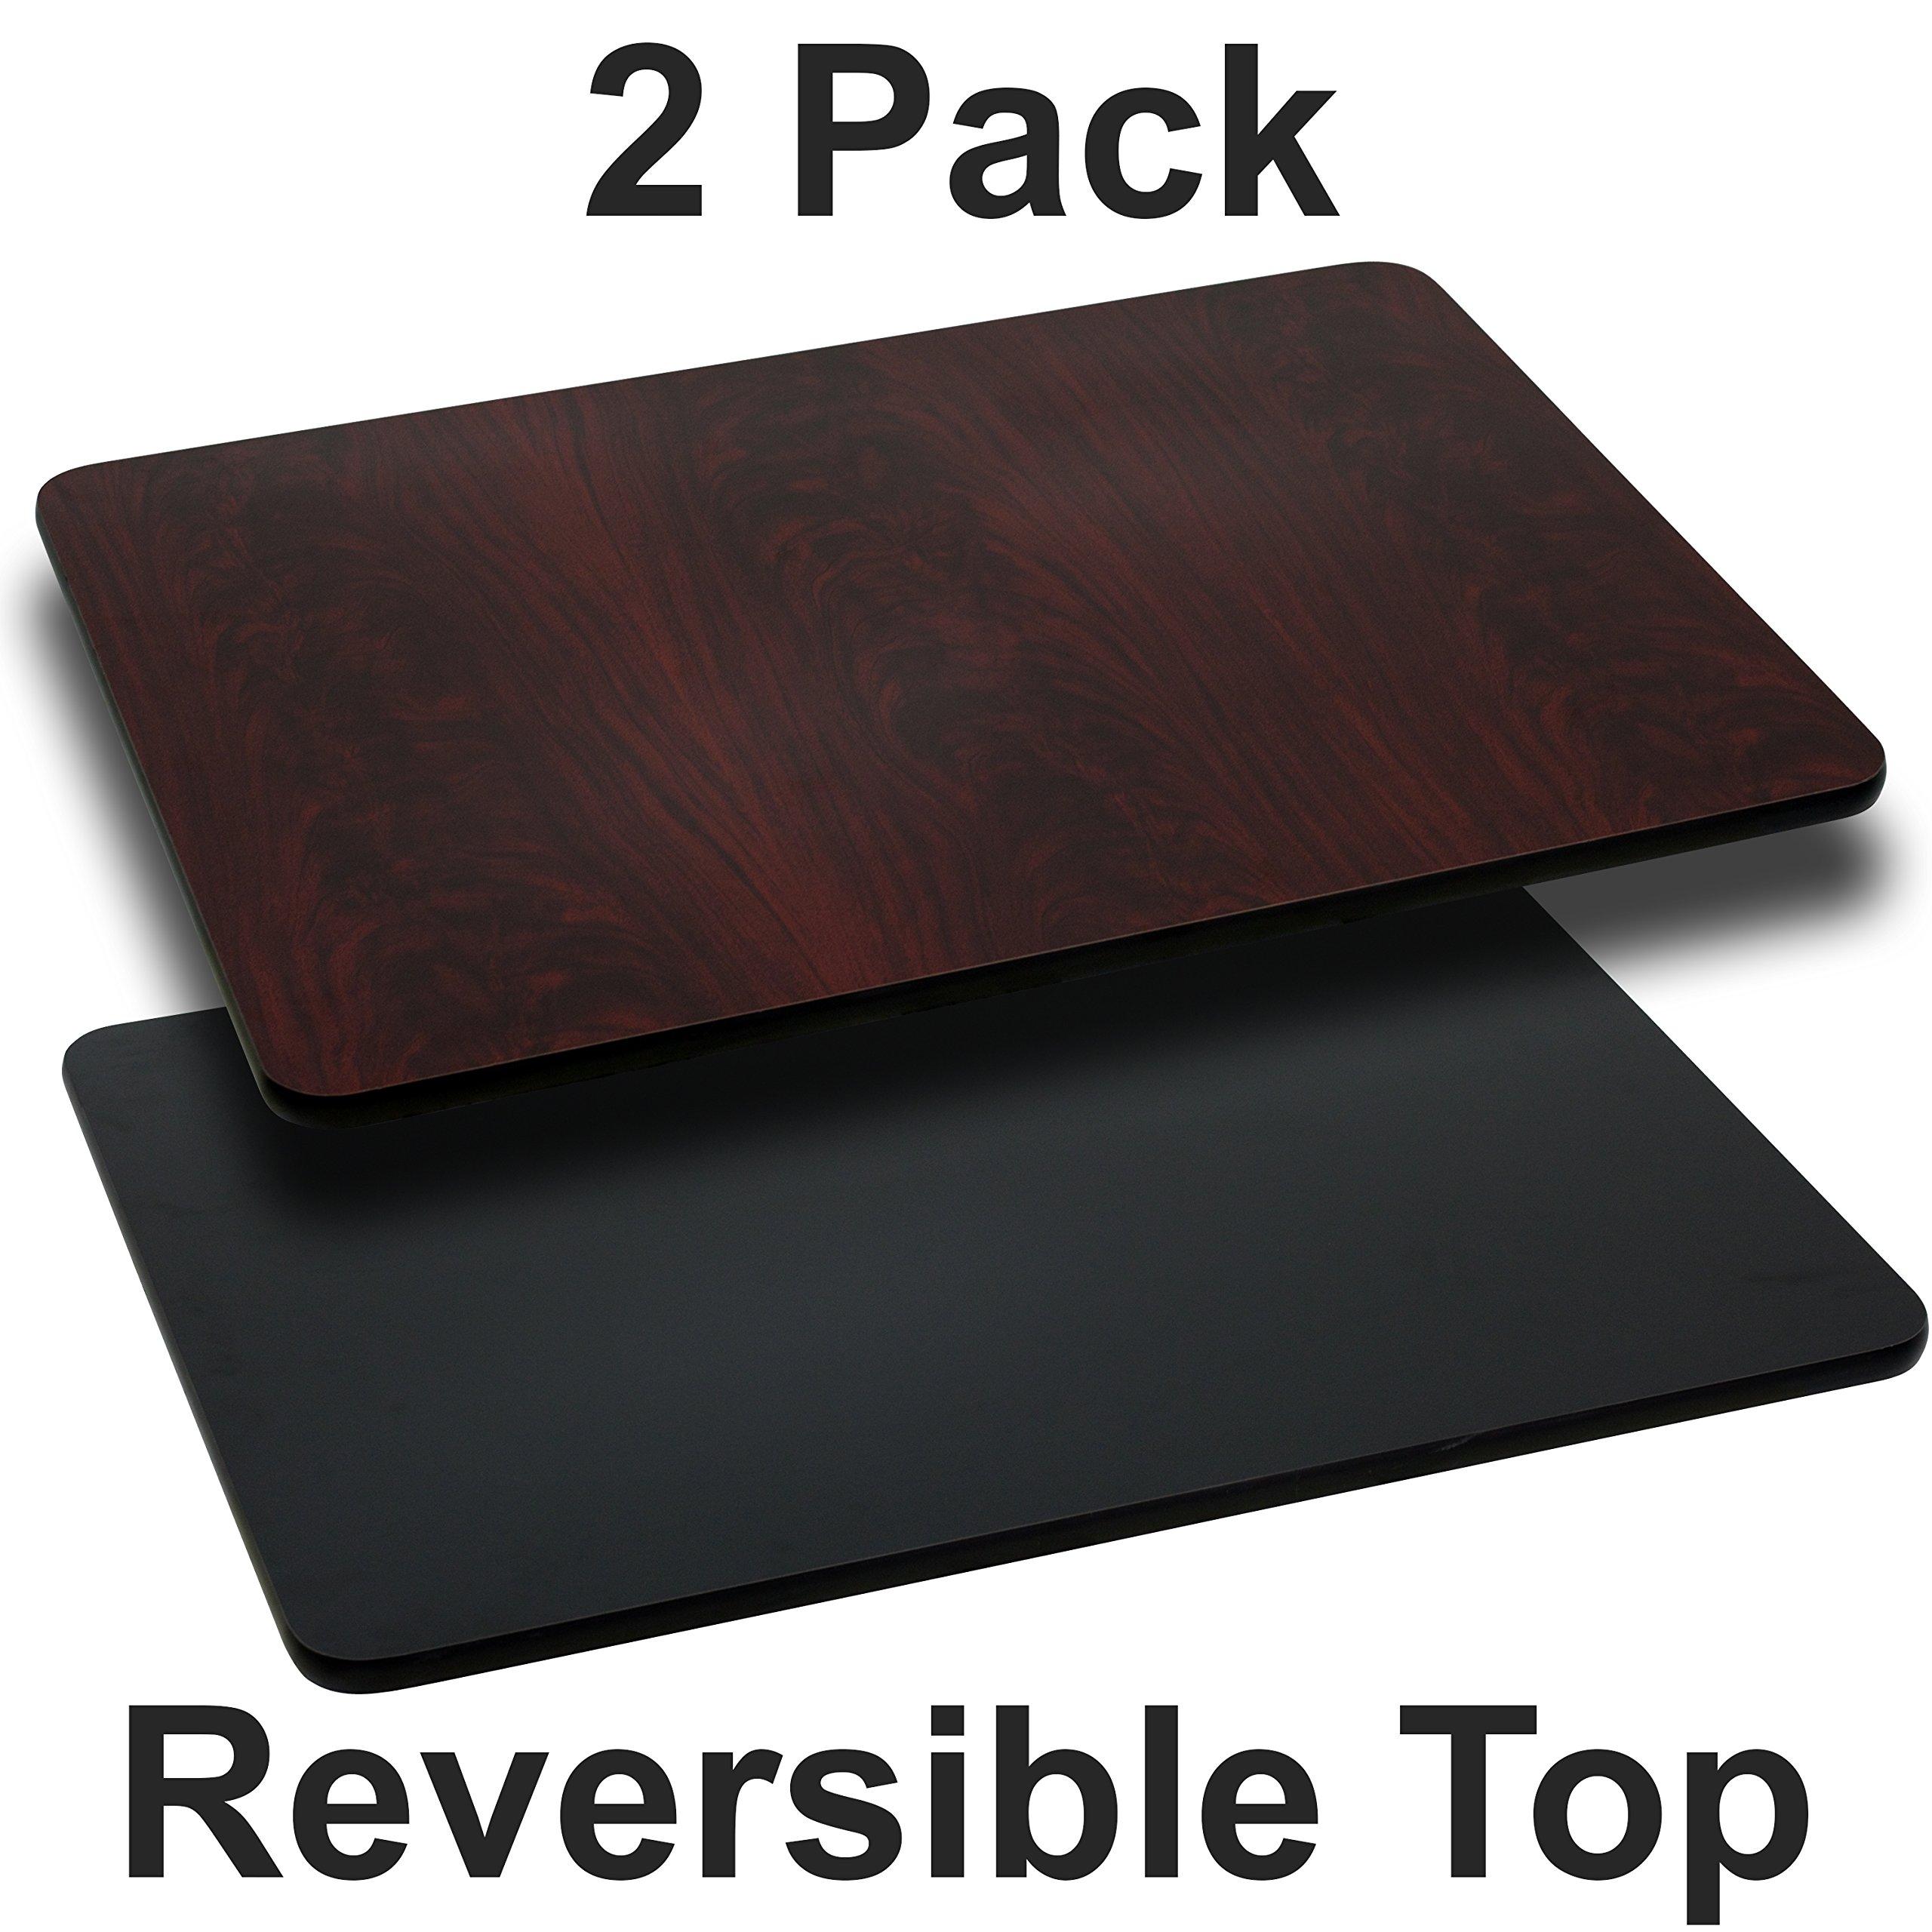 Flash Furniture 2 Pk. 30'' x 48'' Rectangular Table Top with Black or Mahogany Reversible Laminate Top